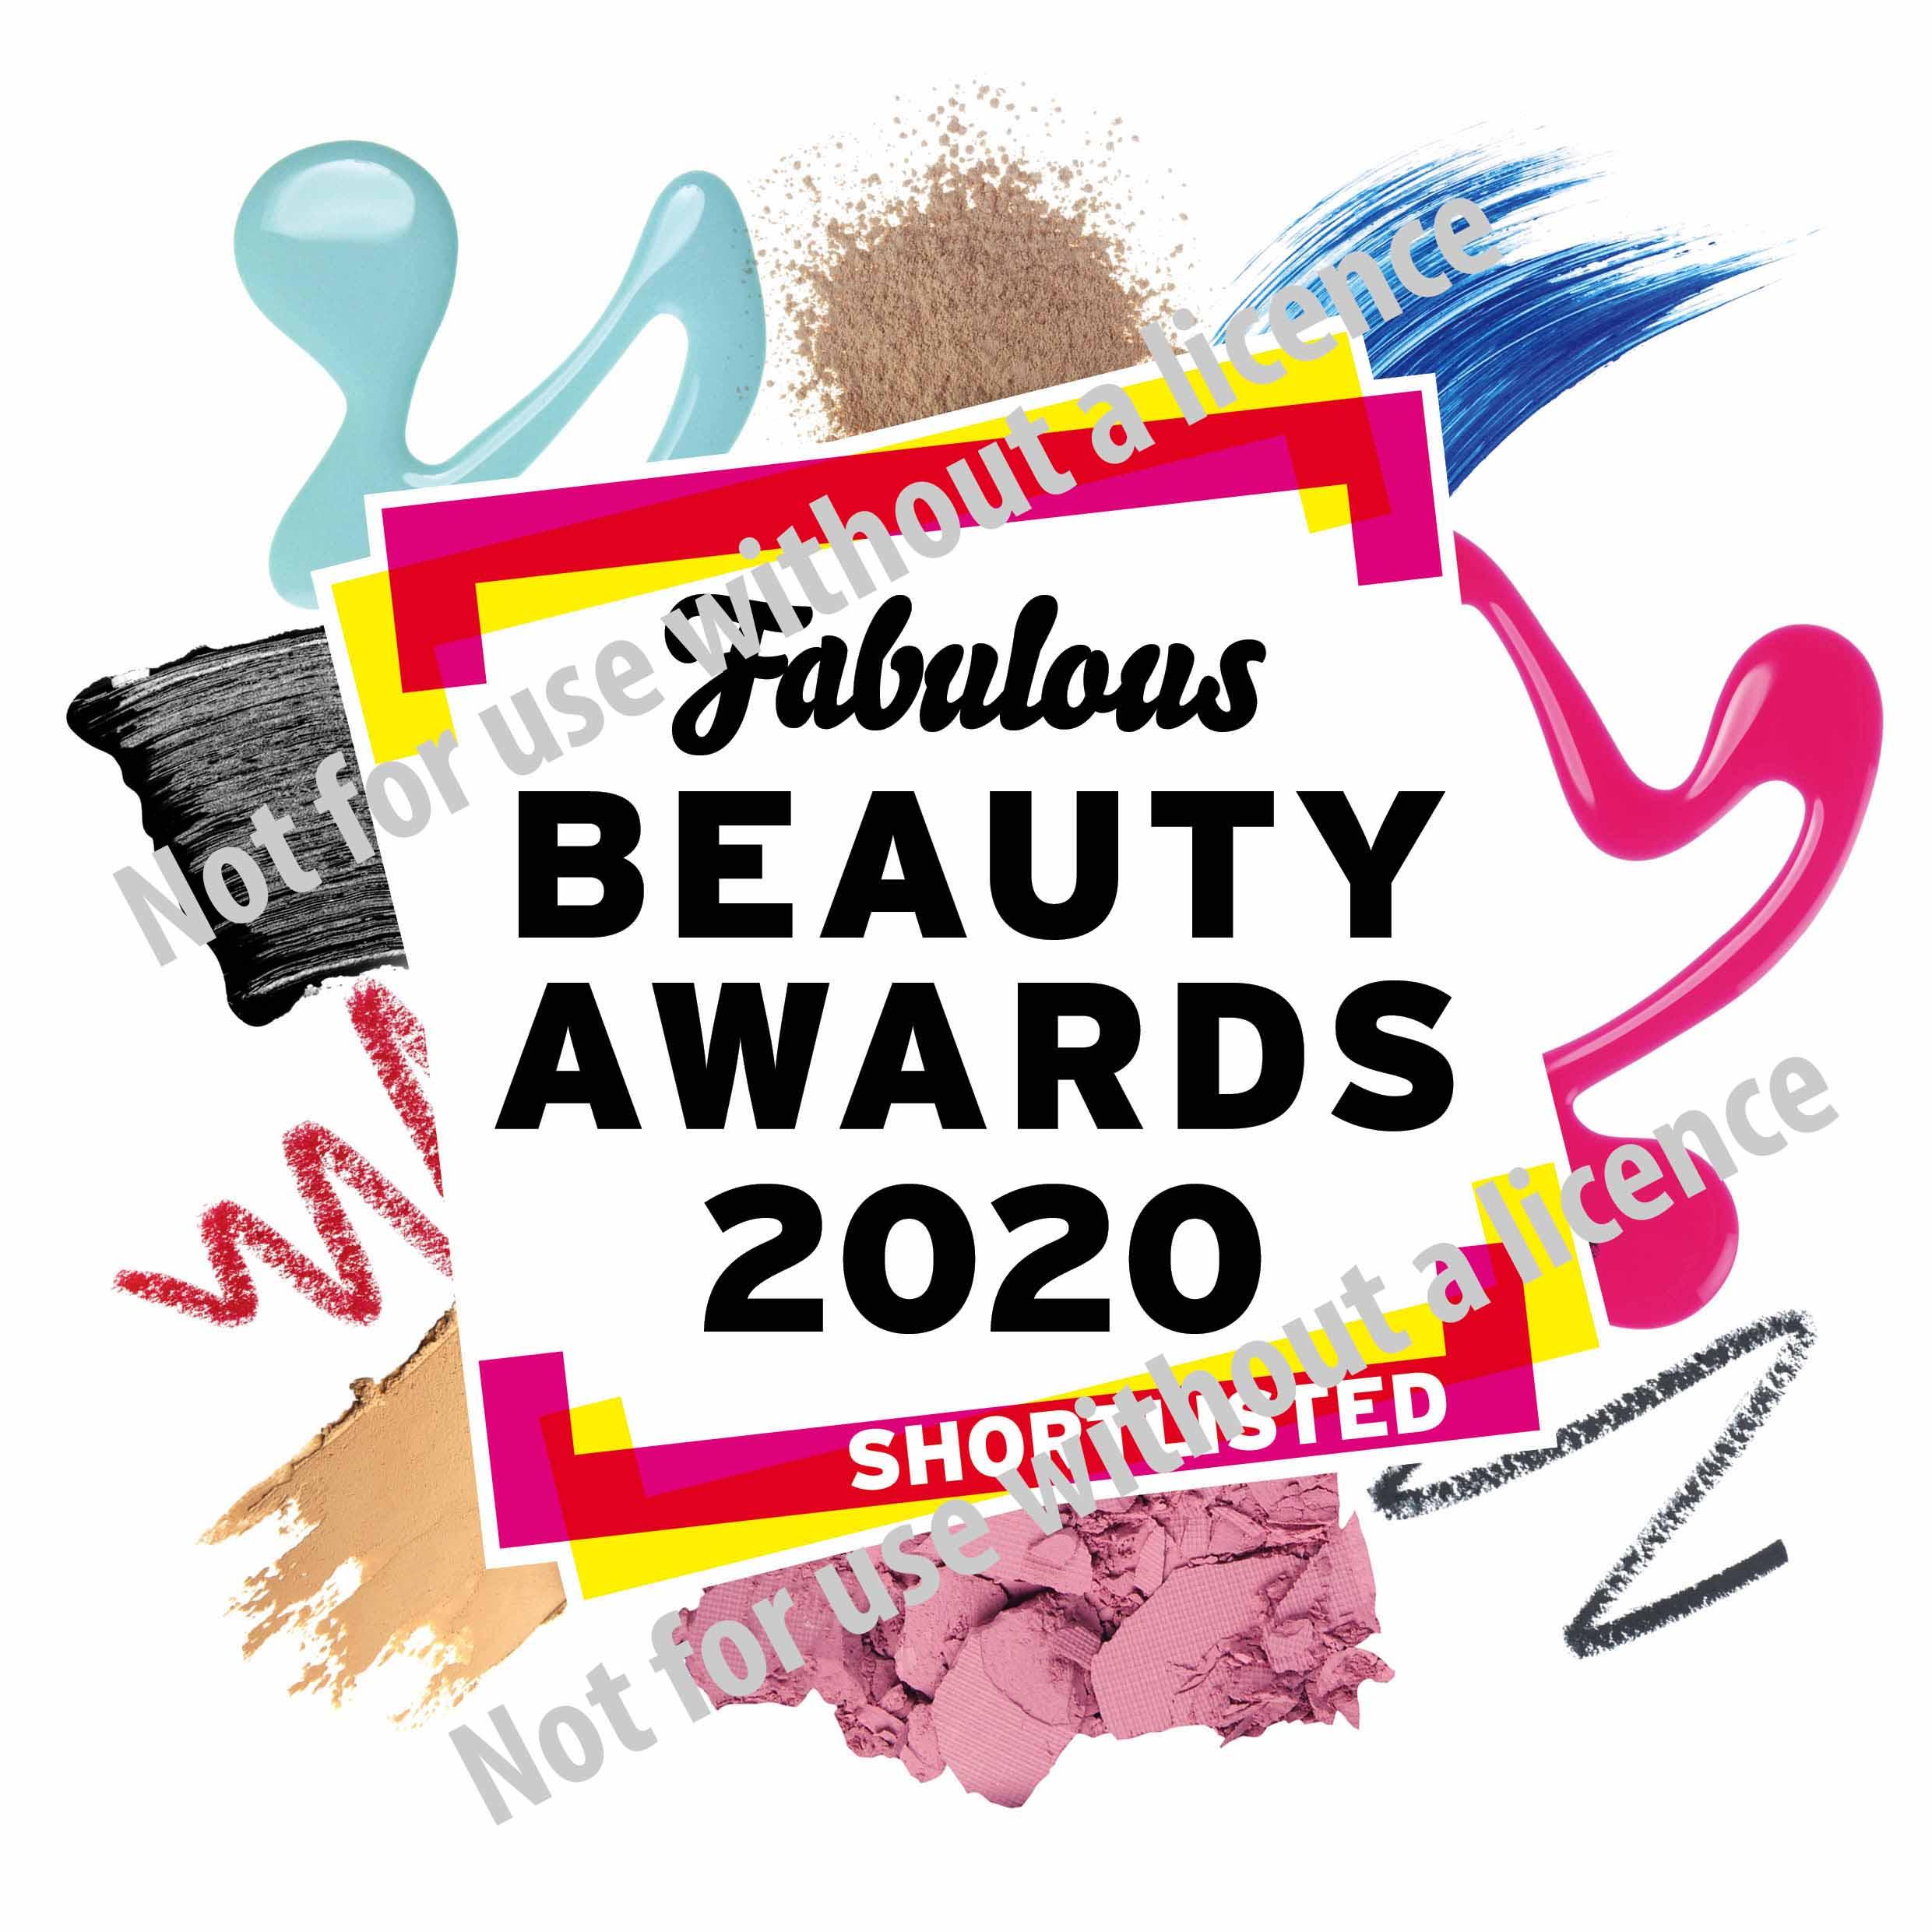 Fabulous Beauty Awards Shortlisted 2020